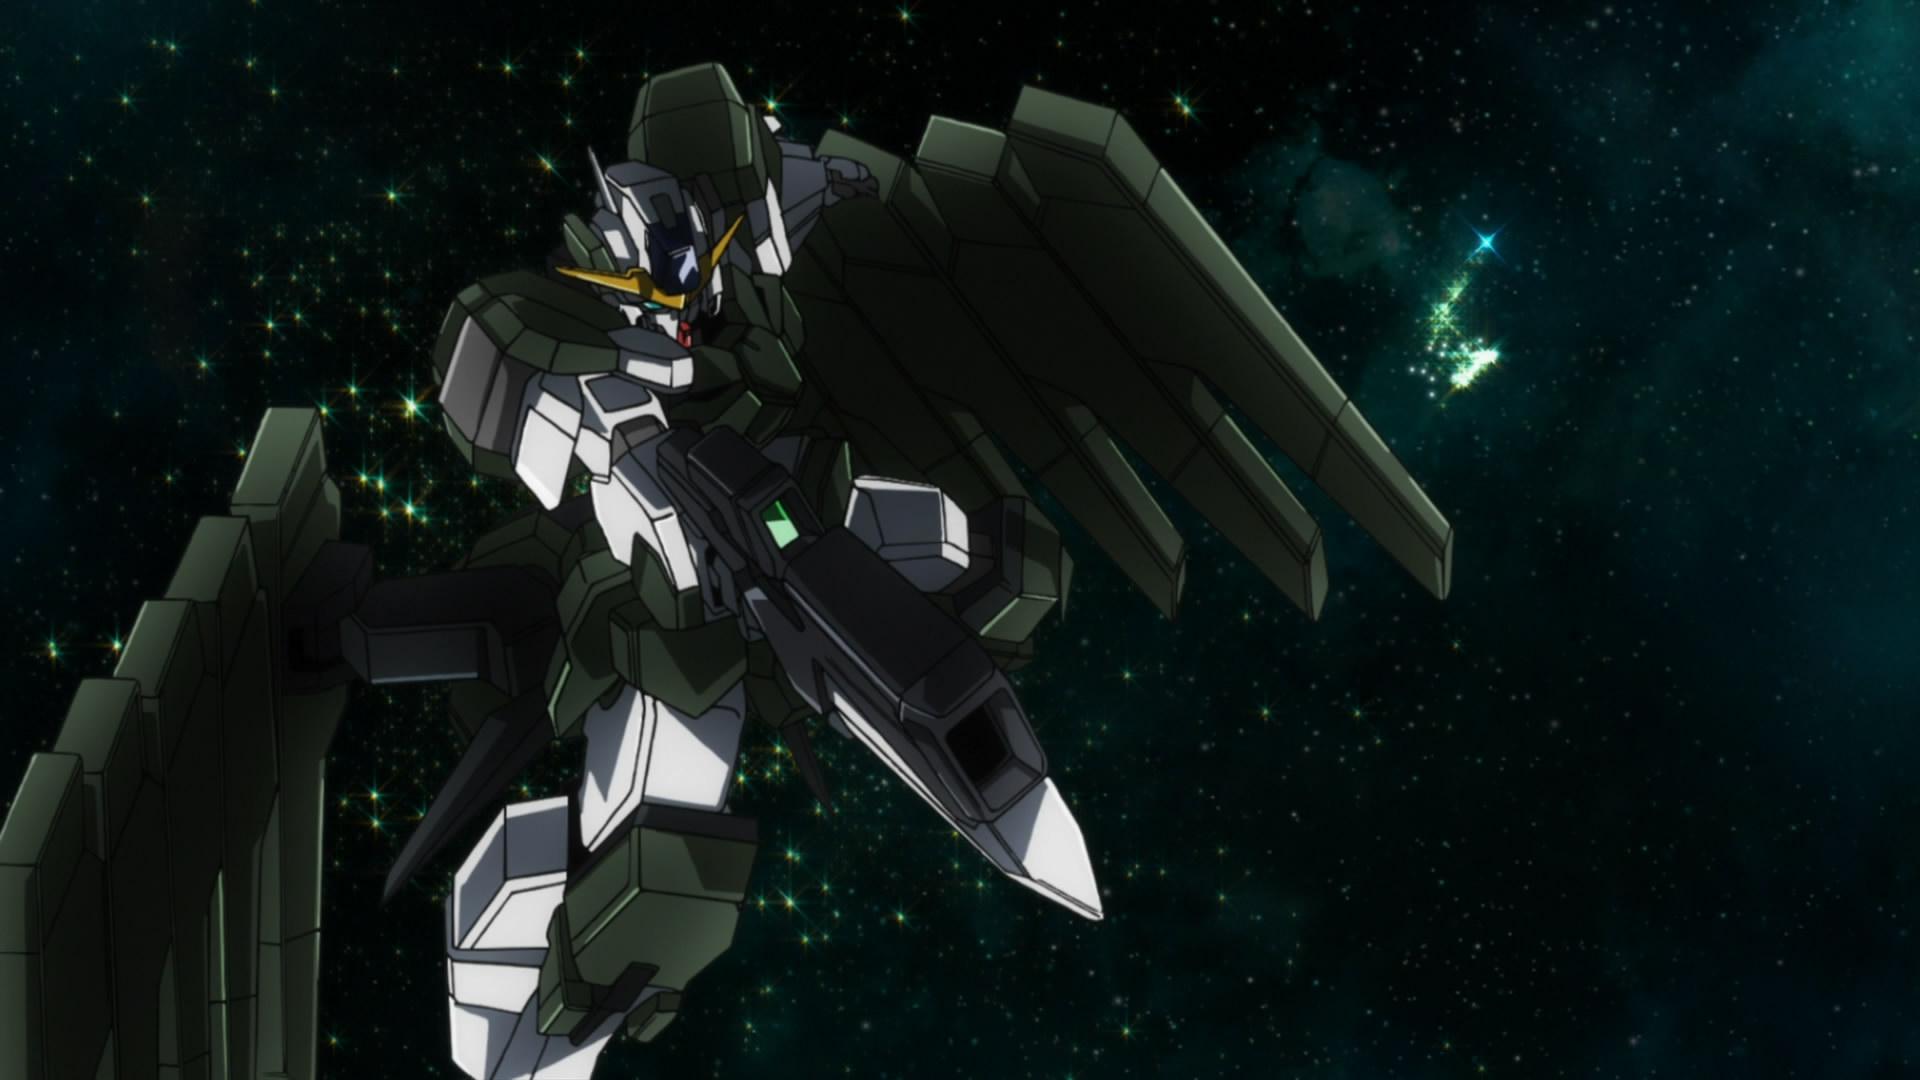 [gSS]_Mobile_Suit_Gundam_00_-_A_wakening_of_the_Trailblazer_(1080p)_[2B252856].mkv_snapshot_00.48.33_[2011.01.07_04.27.52]